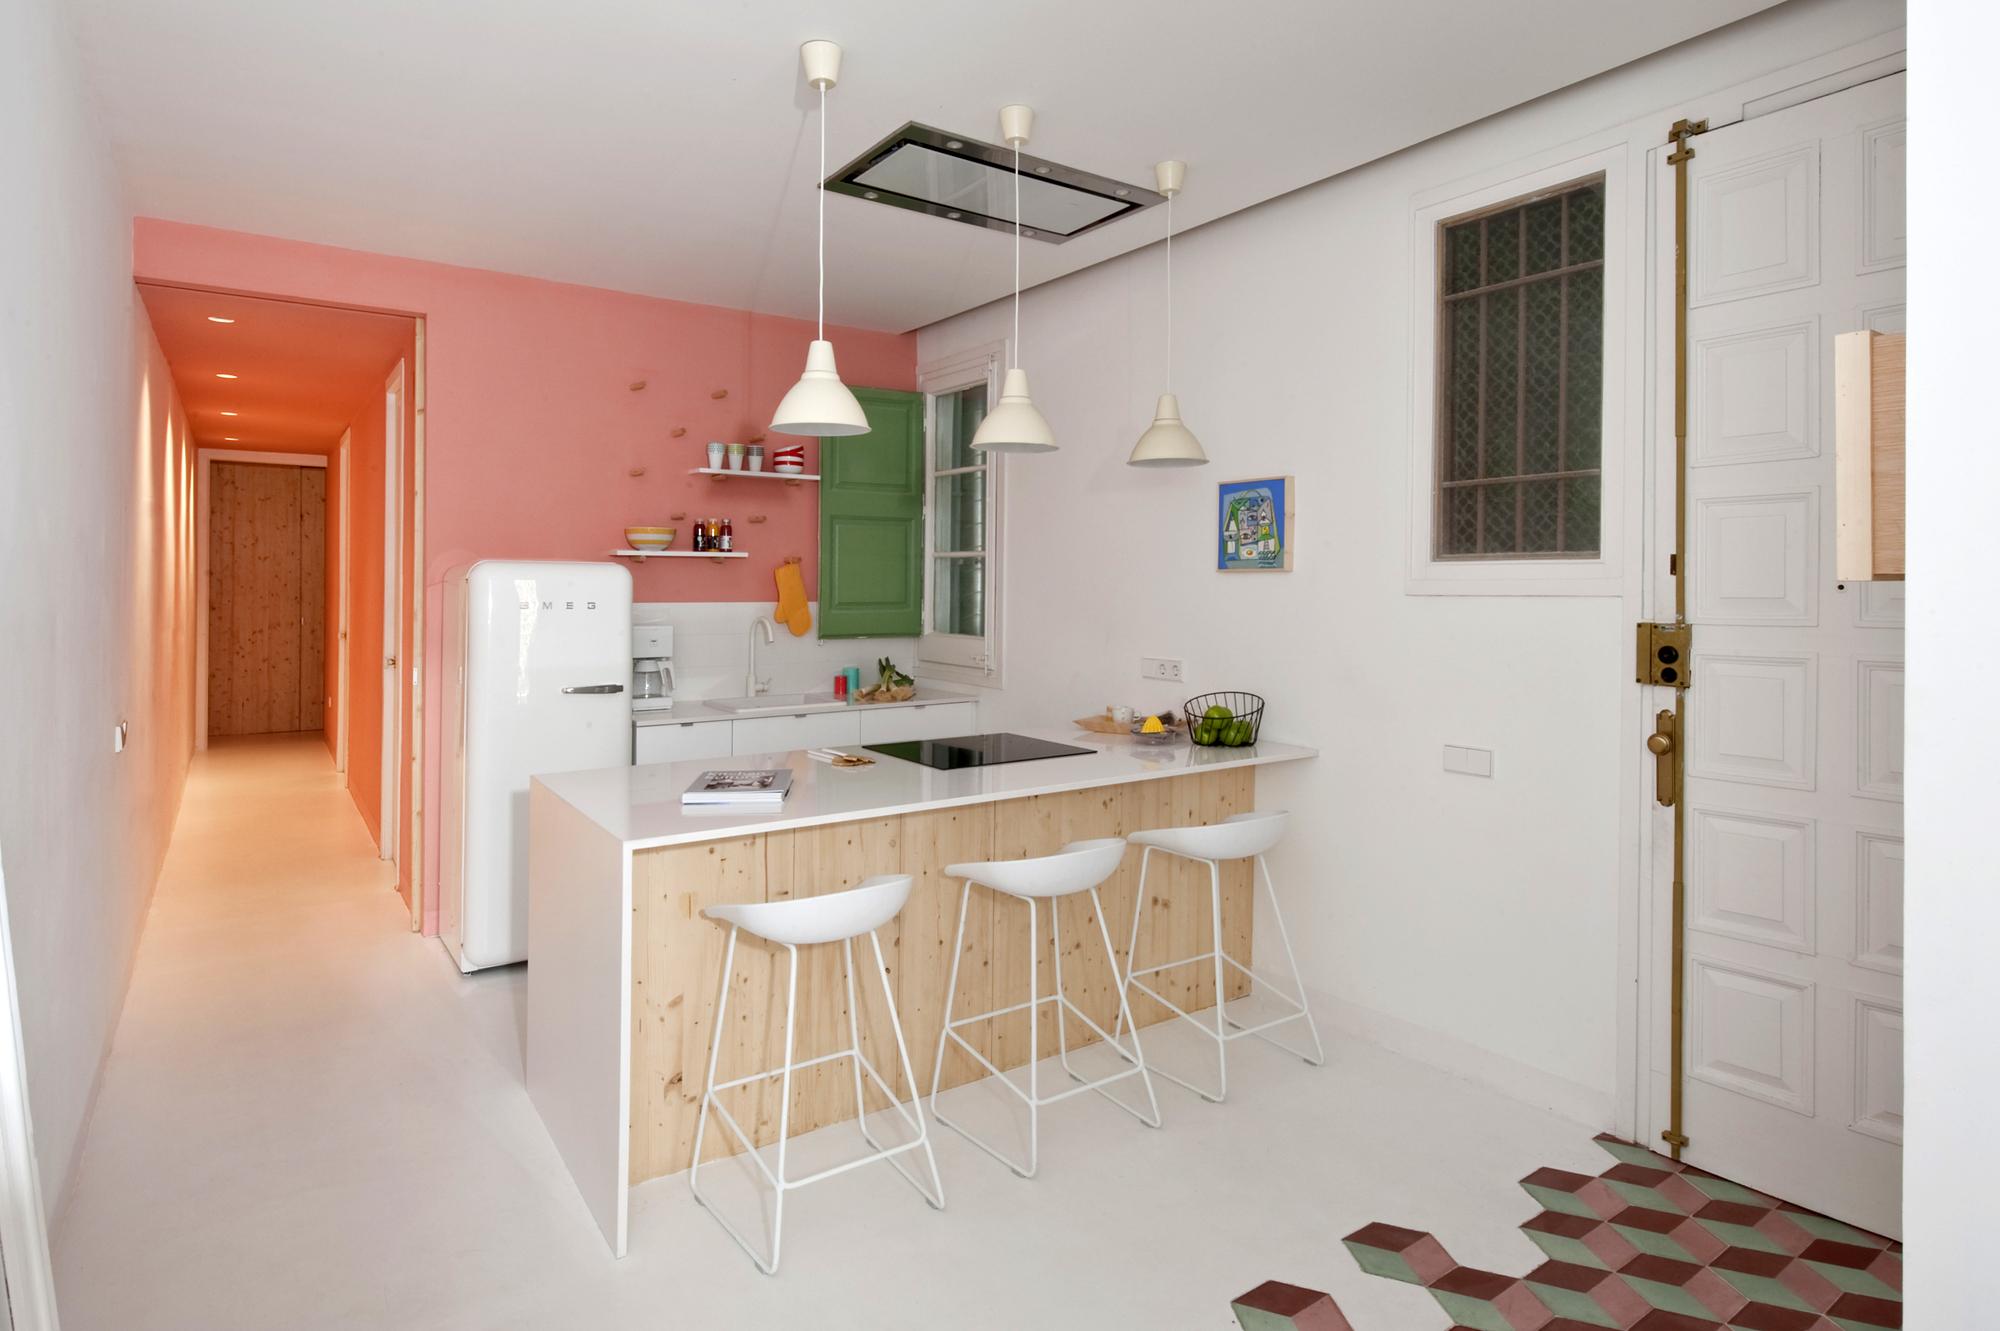 Розовая стена на кухне